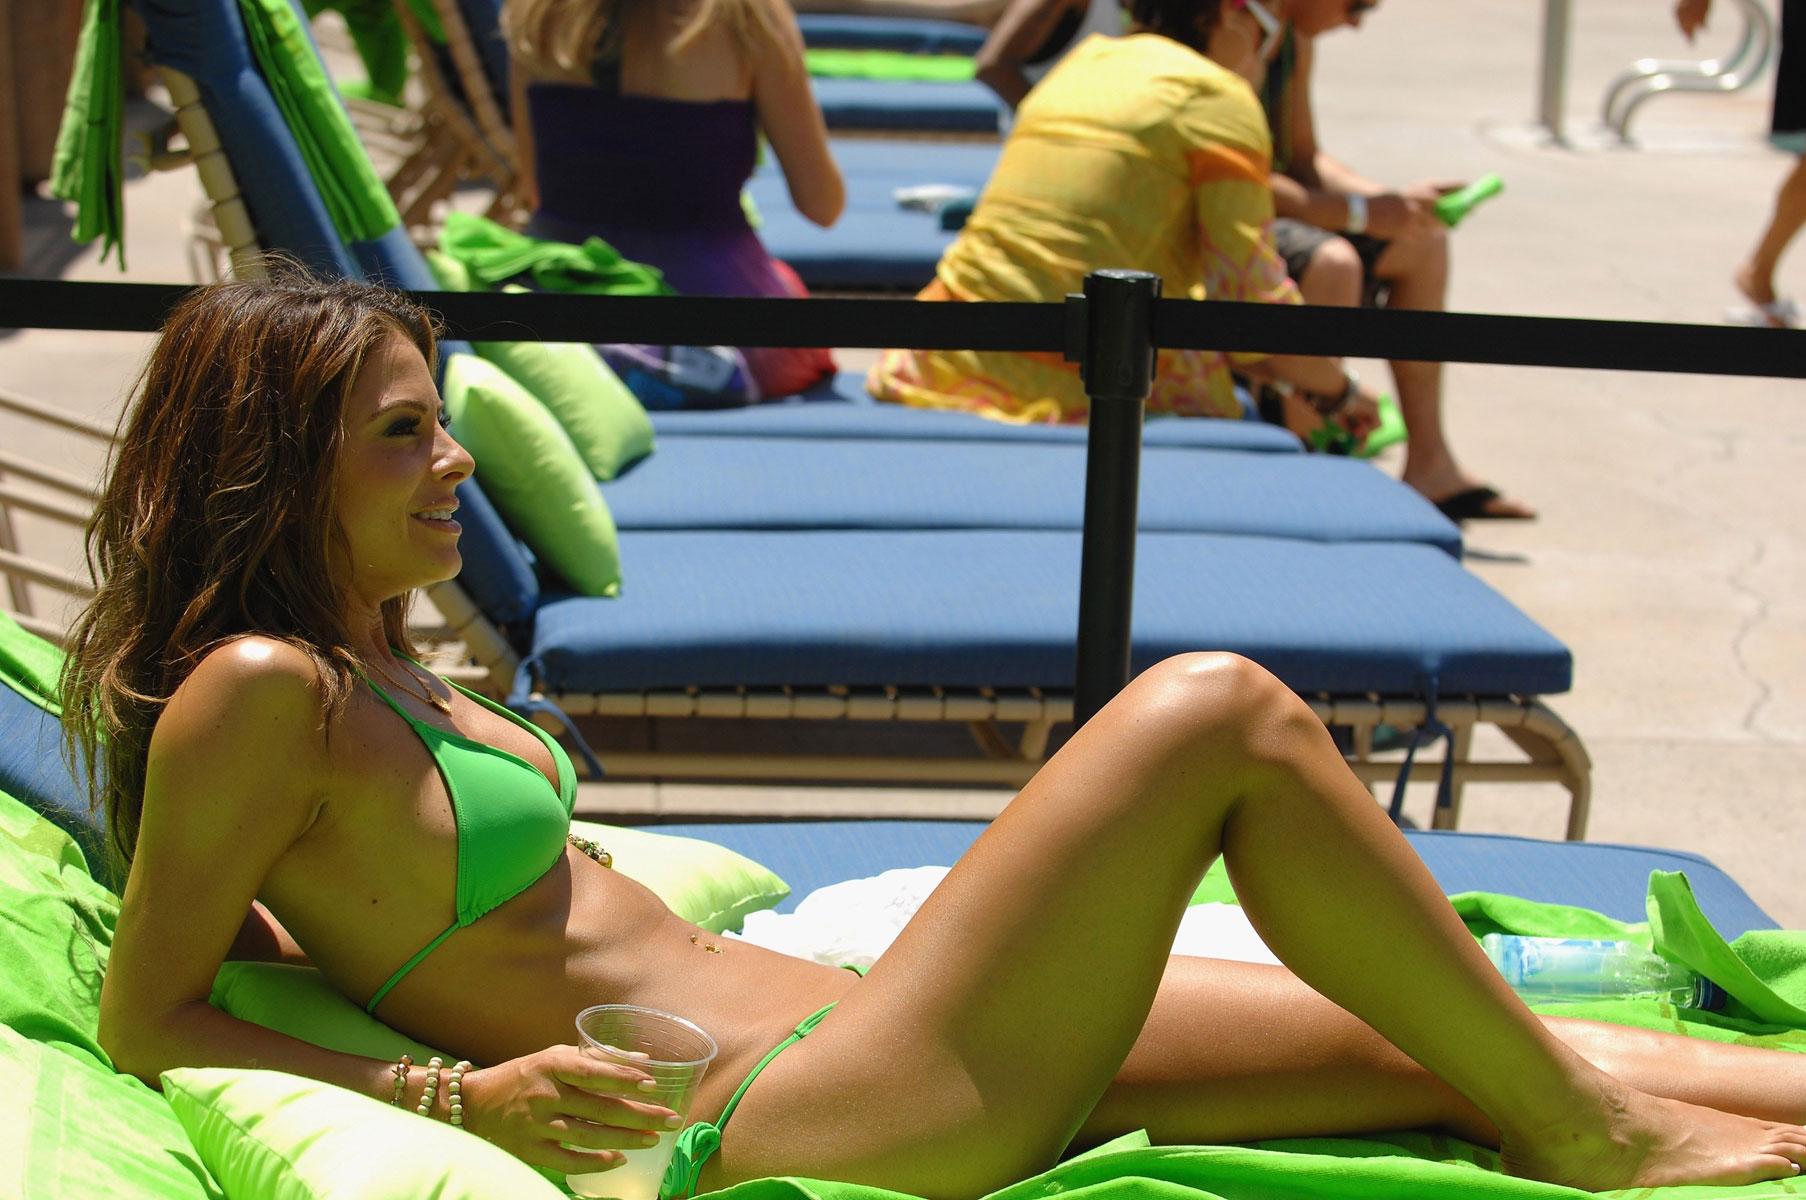 Hot mature russian nude women